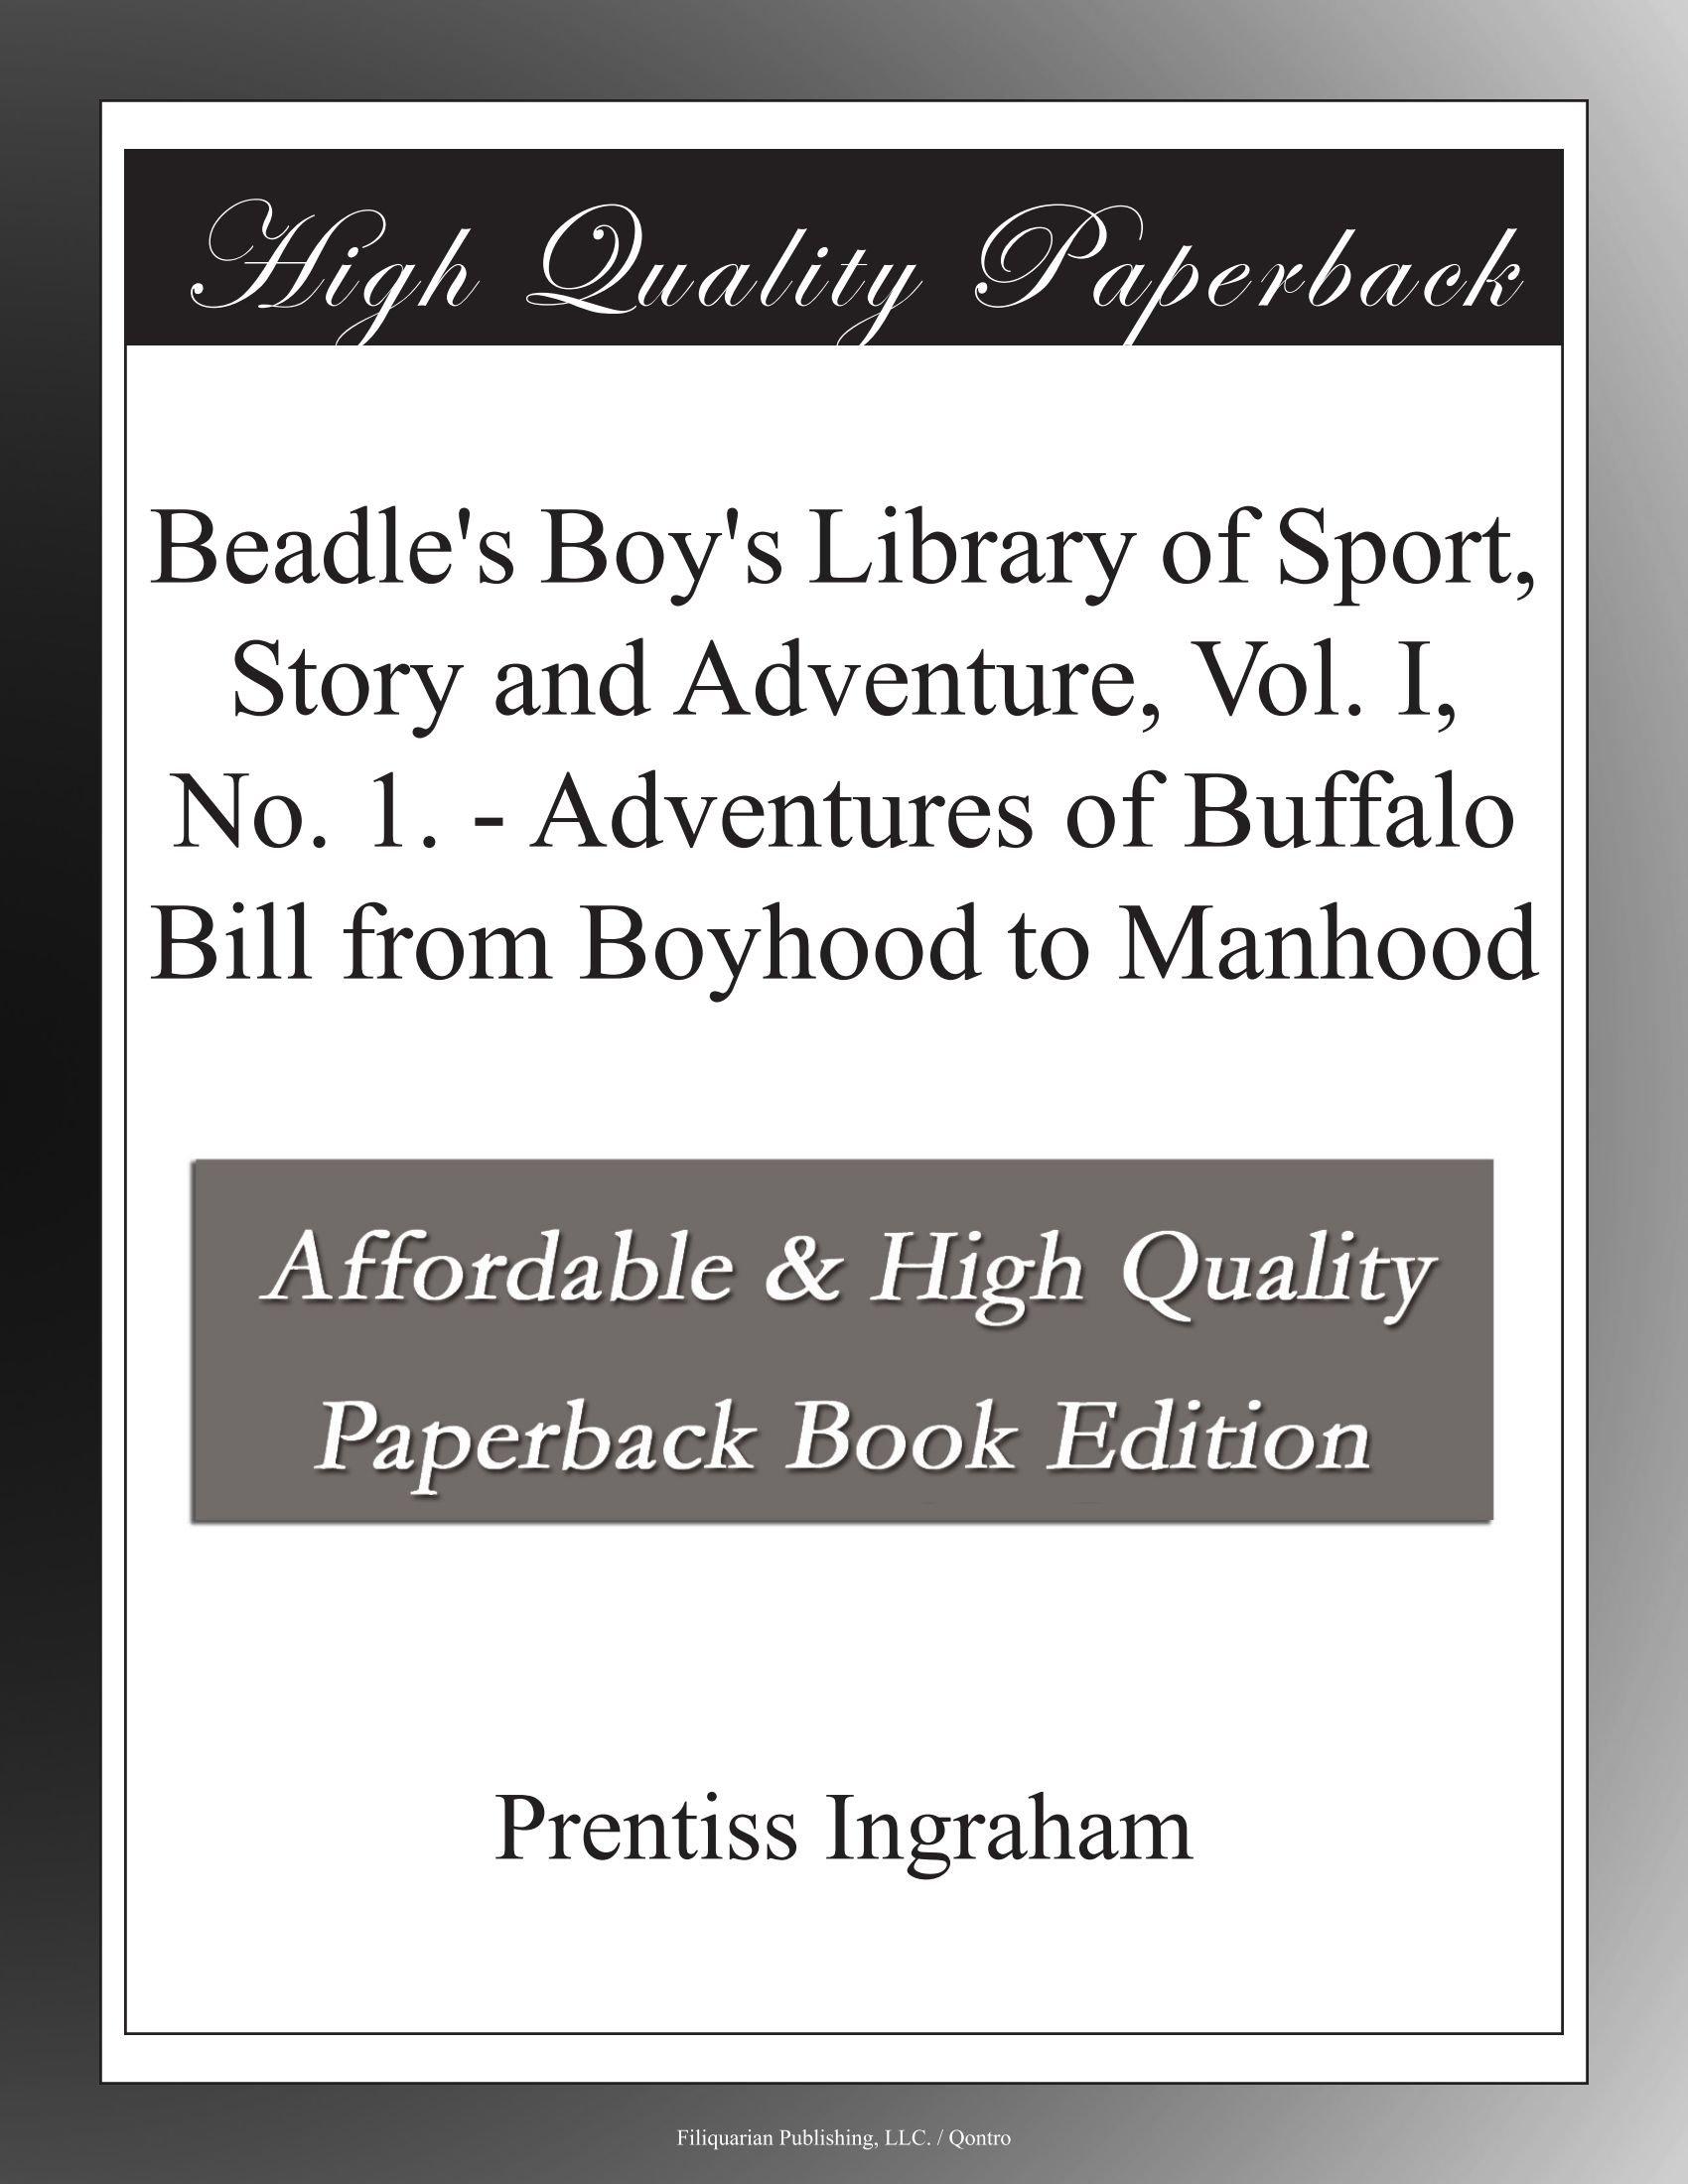 Beadle's Boy's Library of Sport, Story and Adventure, Vol. I, No. 1. - Adventures of Buffalo Bill from Boyhood to Manhood PDF